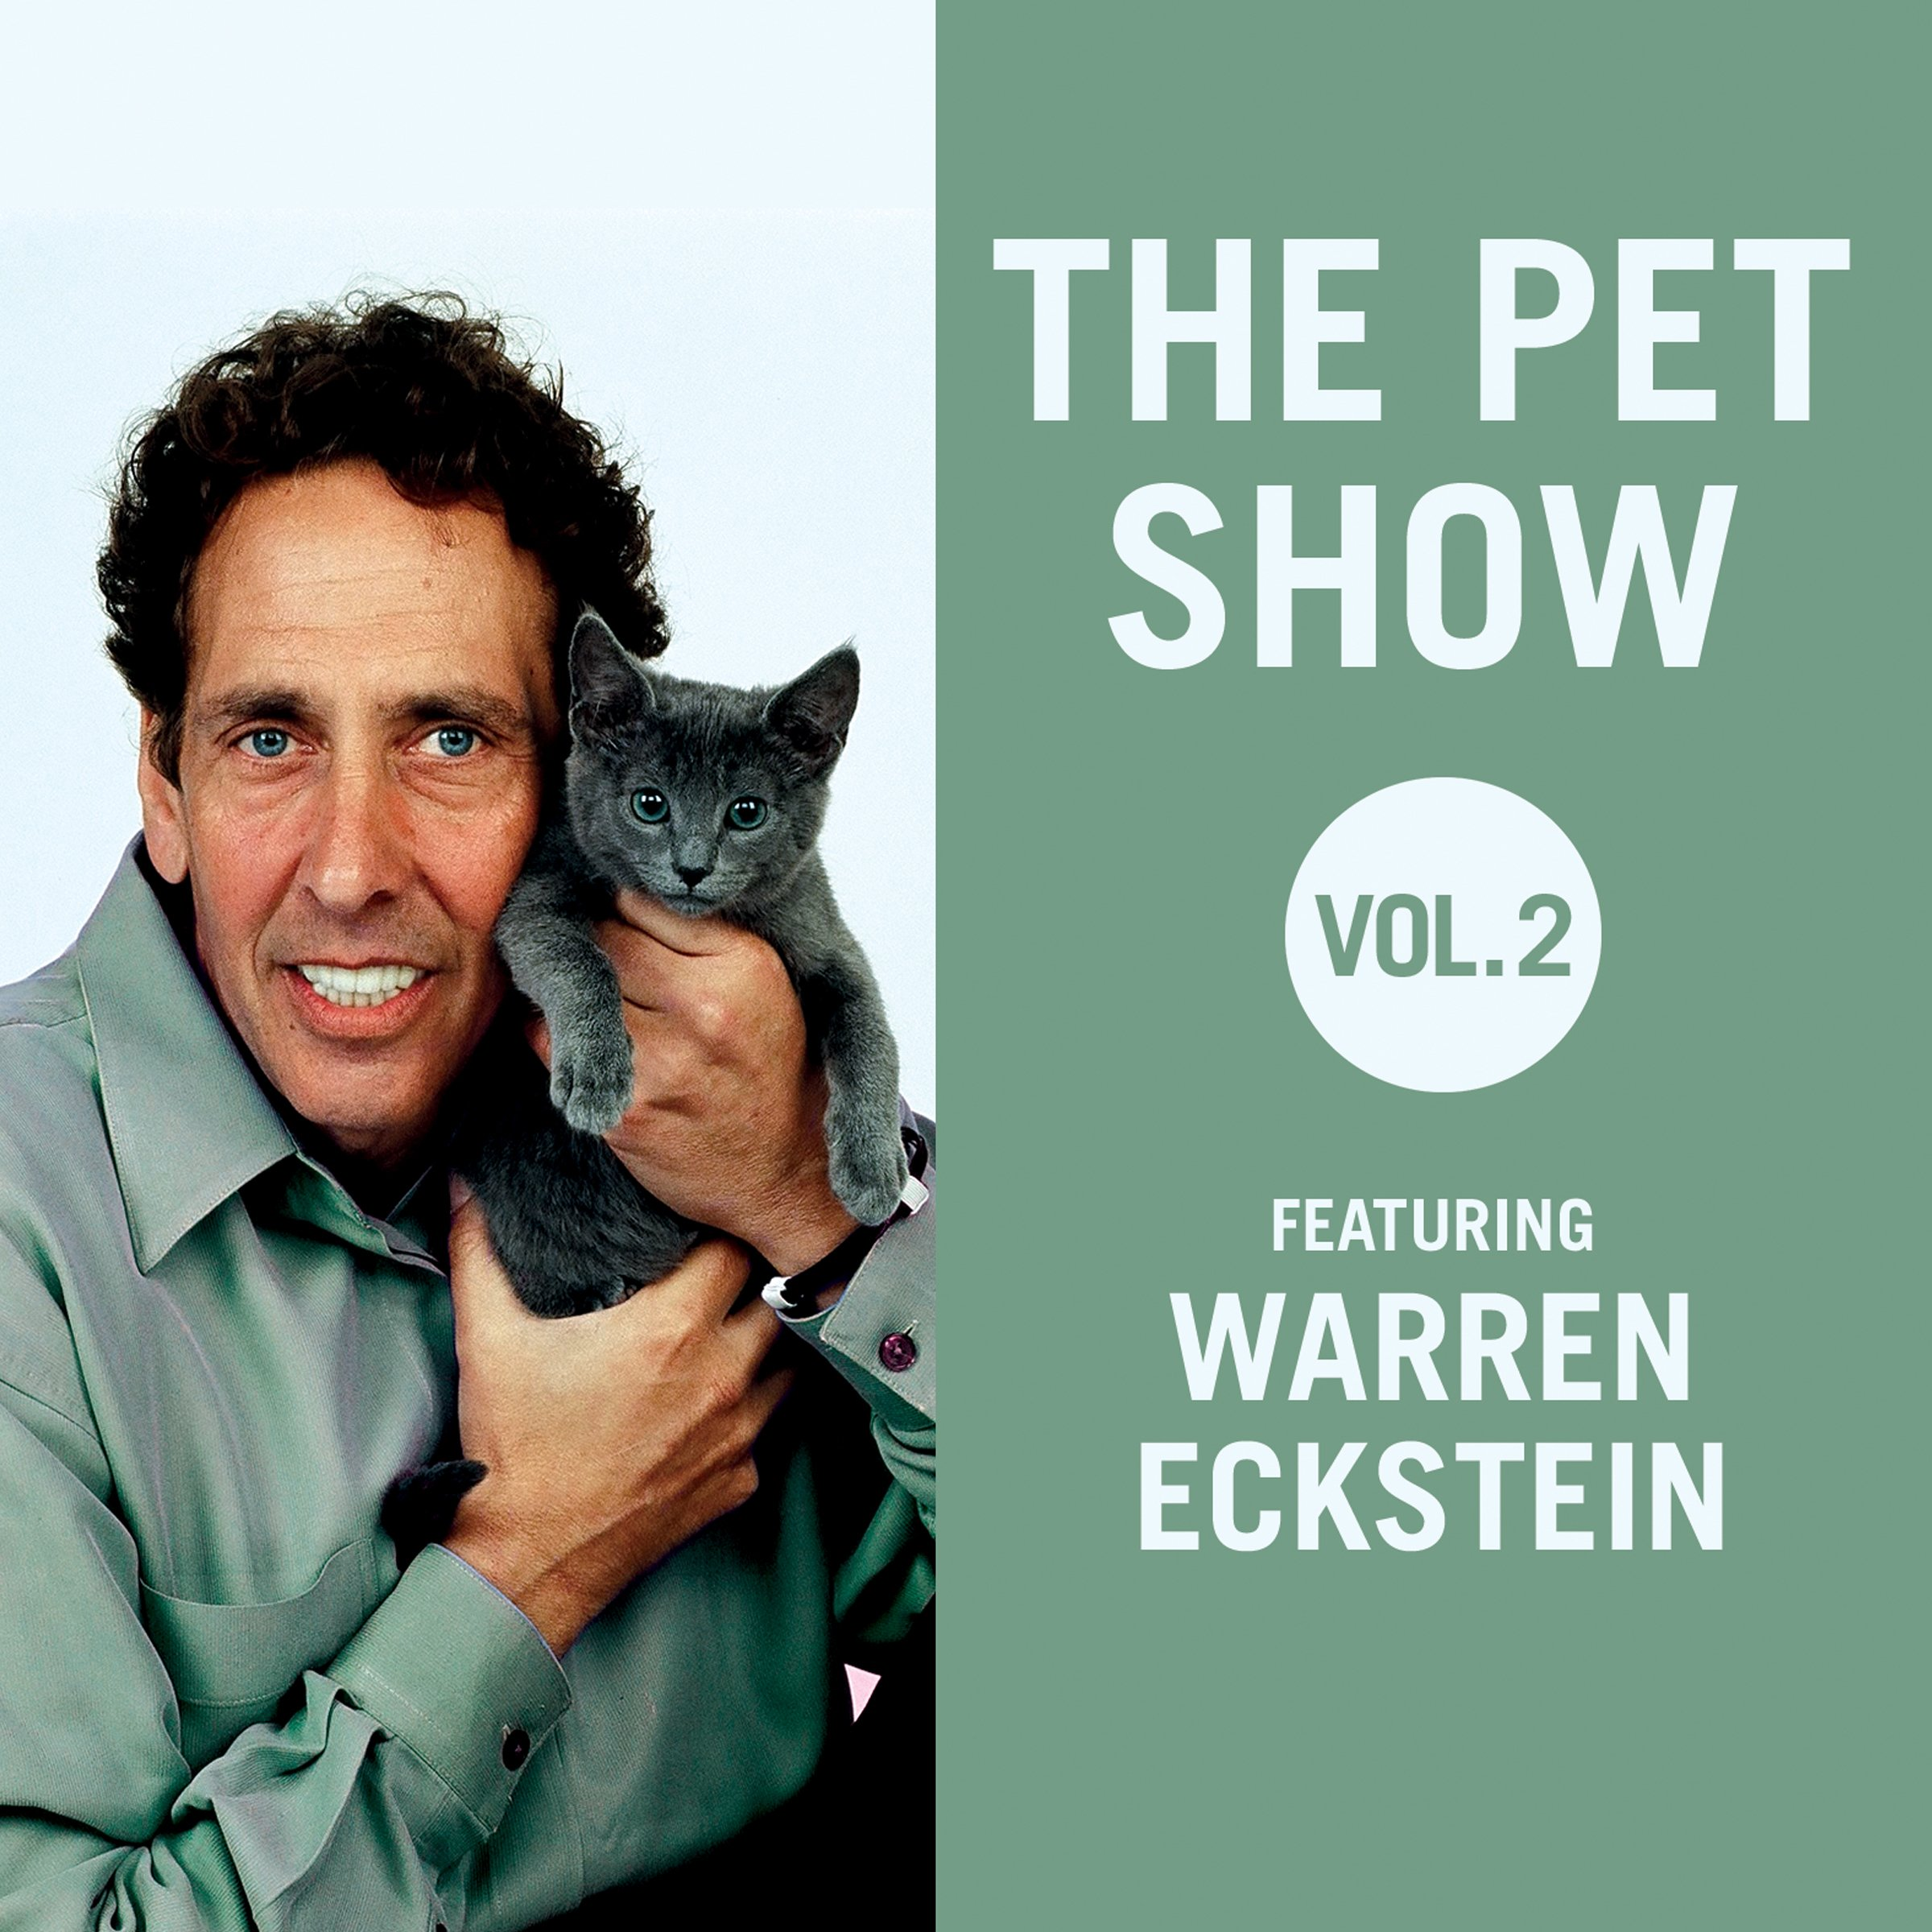 The Pet Show, Vol. 2: Featuring Warren Eckstein